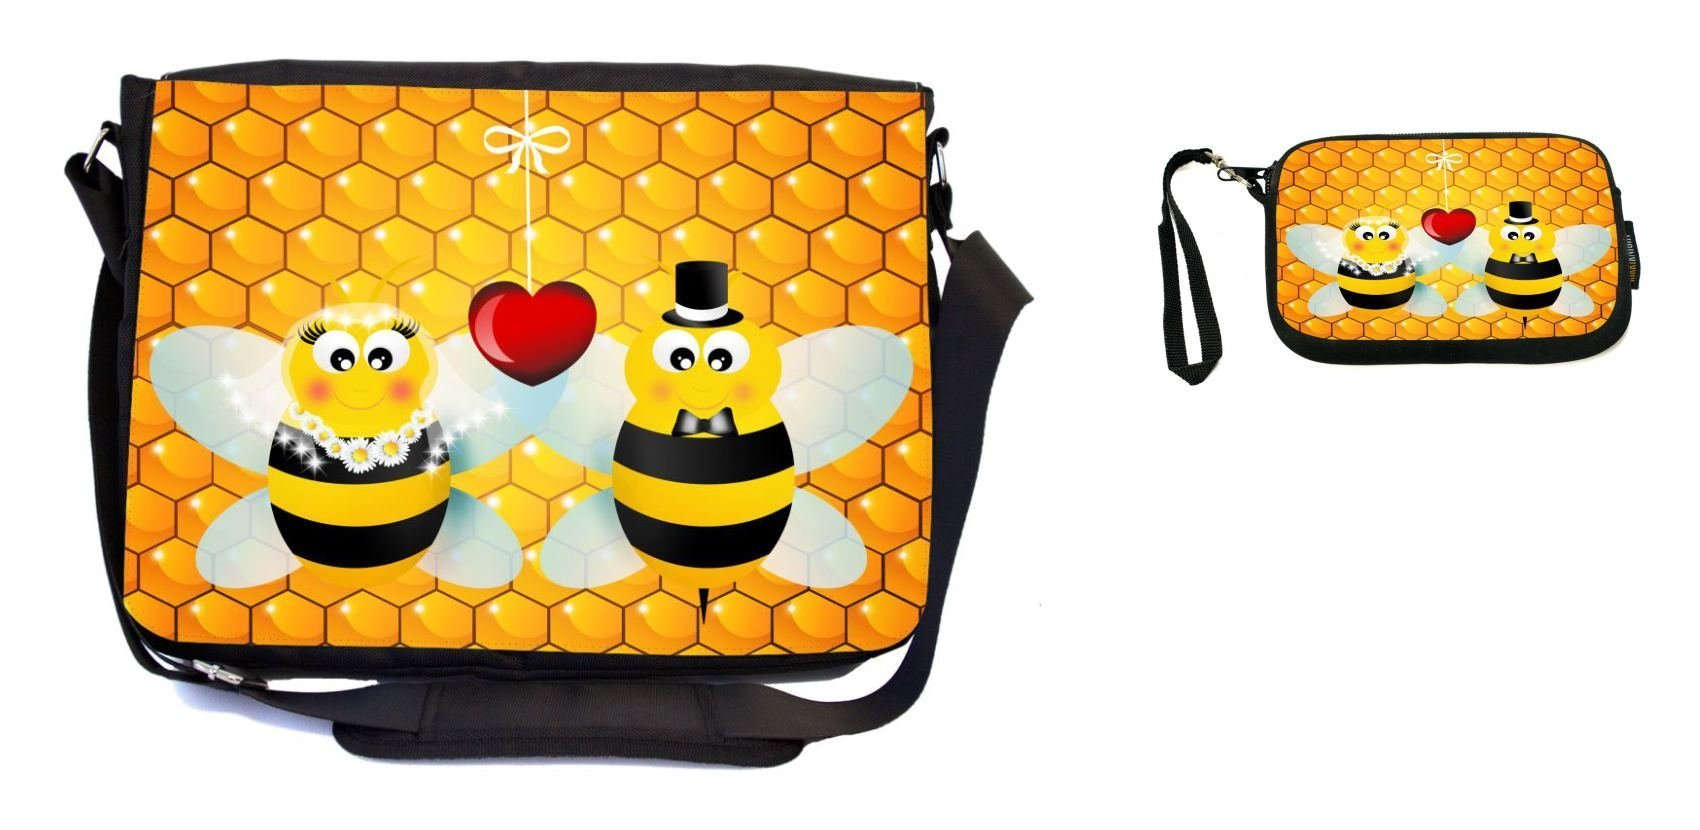 Rikki Knight Bumble Bees in Love Wedding Illustration Design Messenger Bag - School Bag - Laptop Bag - with Padded Insert - Includes UKBK Premium Coin Purse